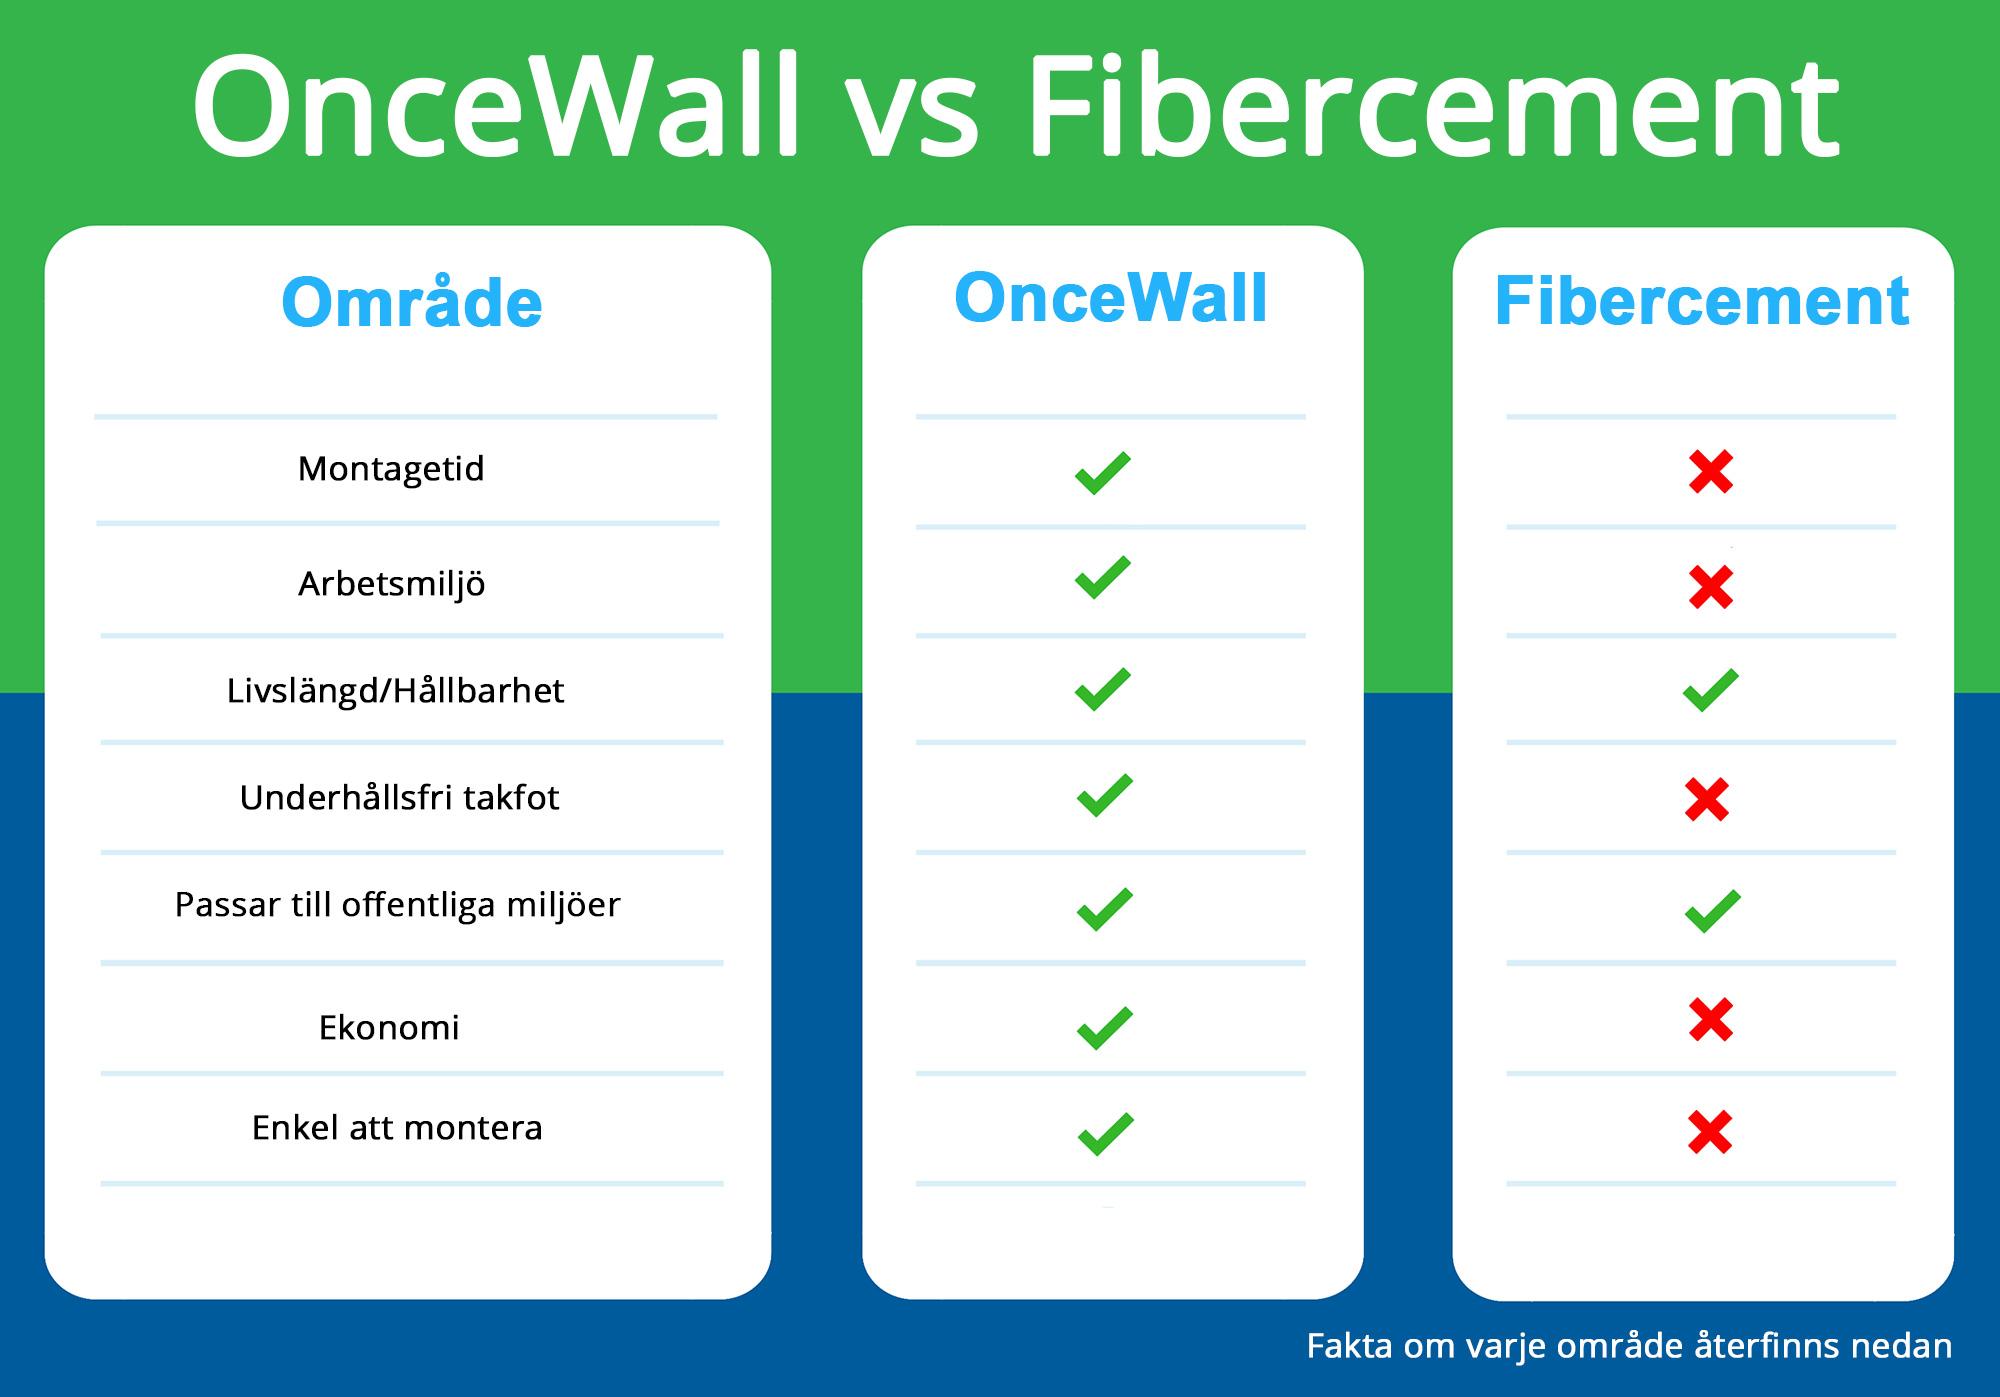 OnceWall vs fibercement